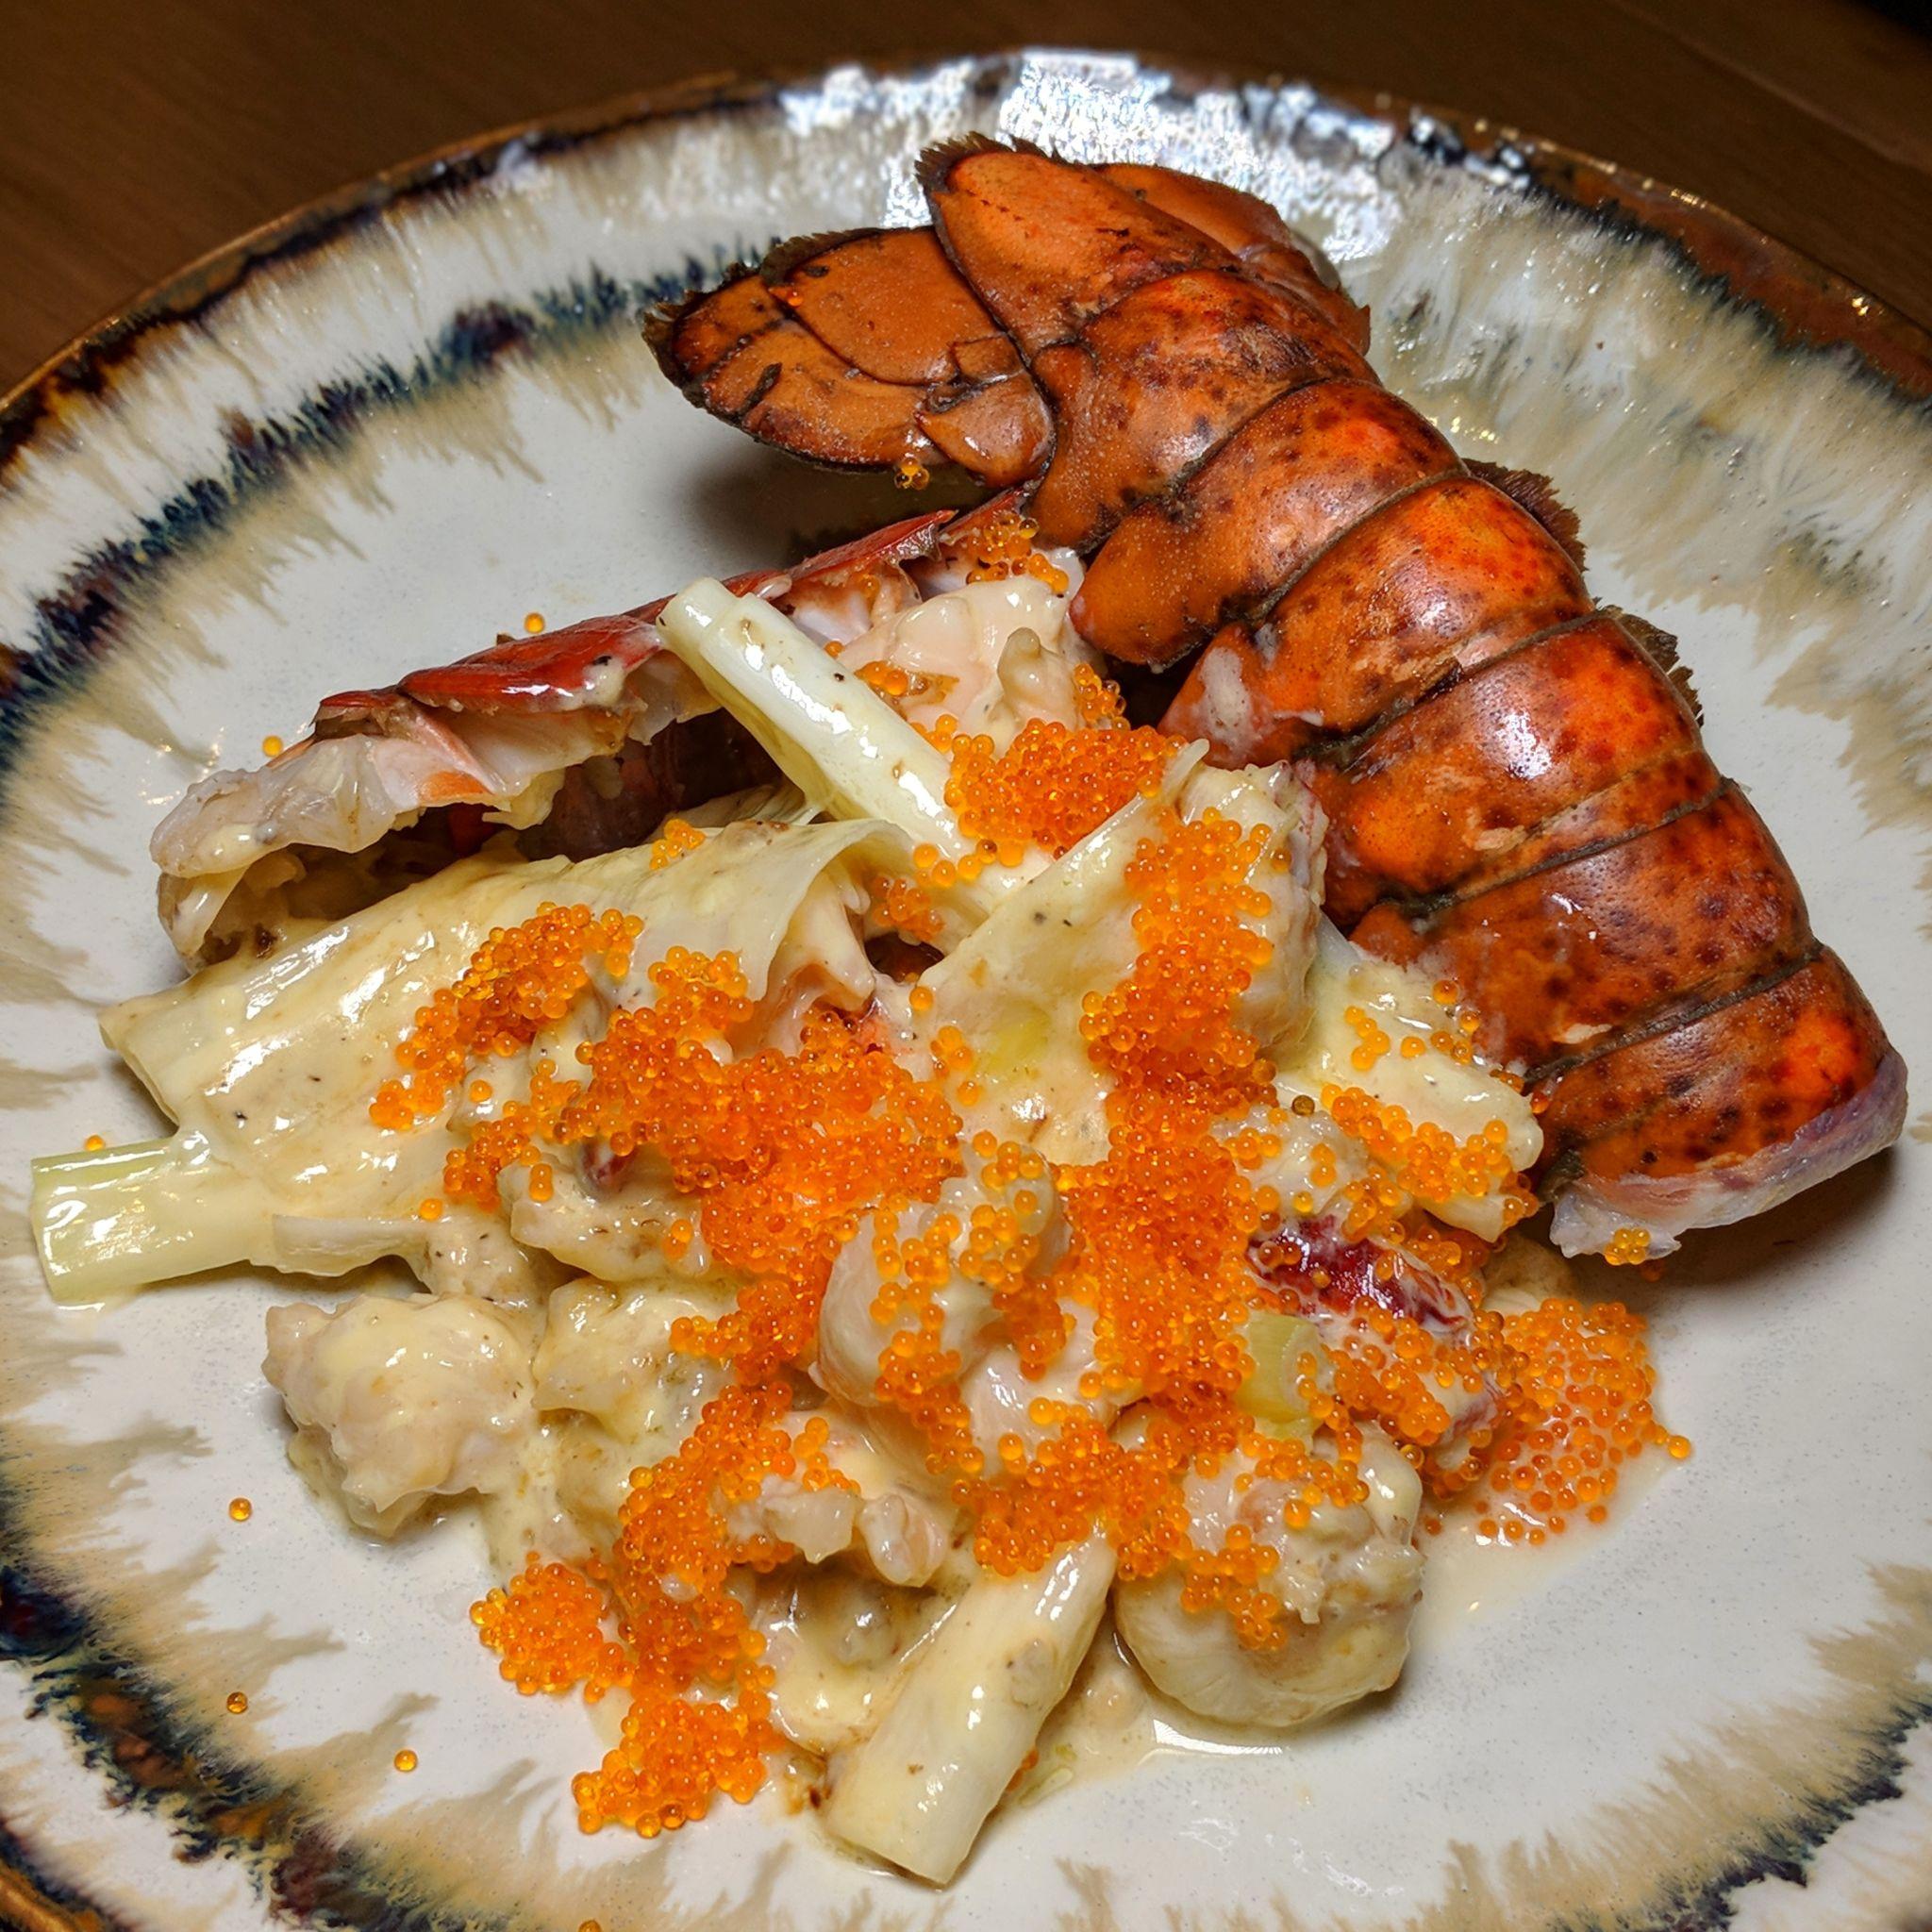 Restaurant Review: Plum and Toro - Japanese Bincho and